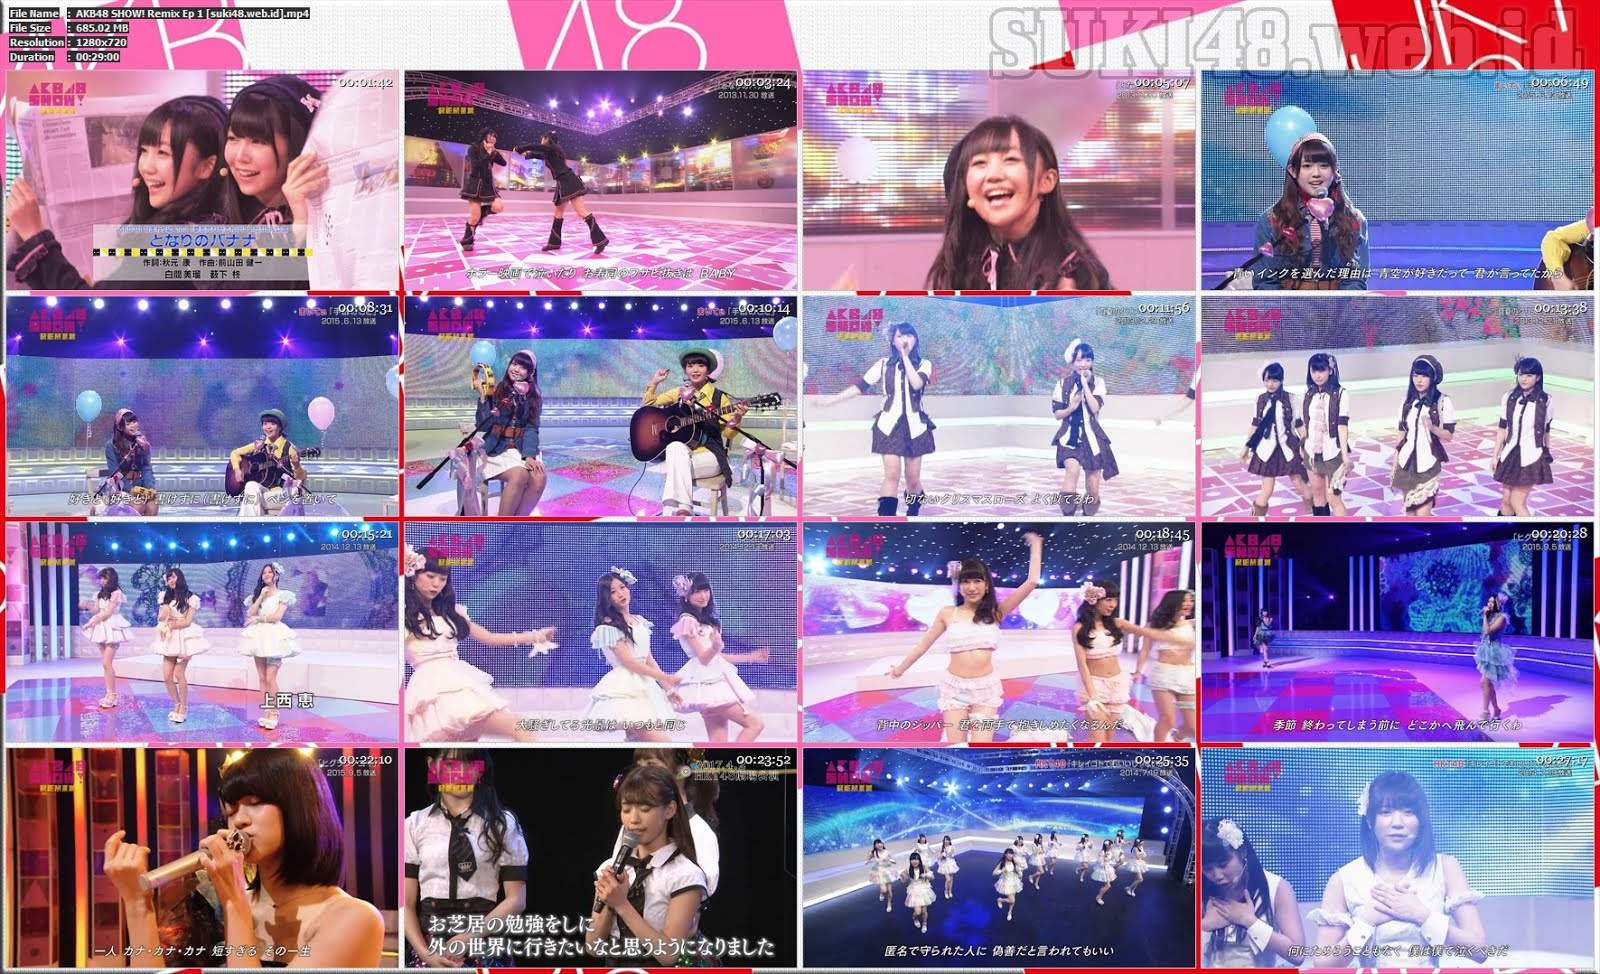 AKB48 SHOW! Remix Ep 1 – SUKI48